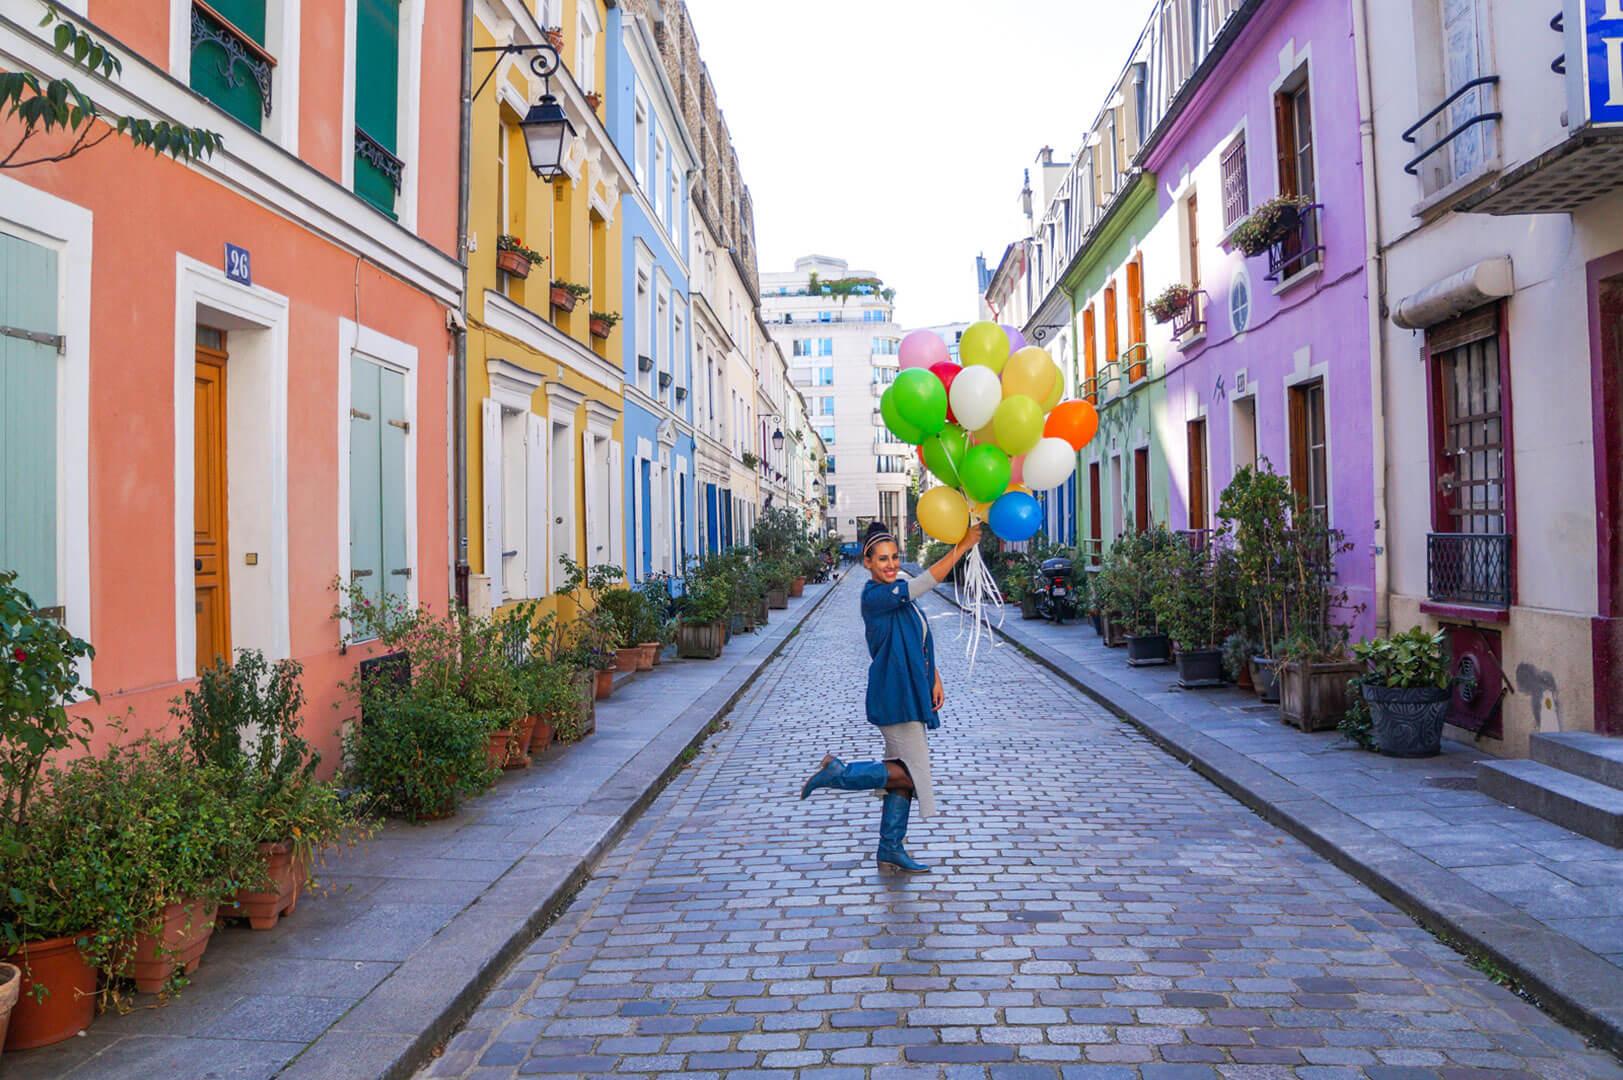 rue-cremieux-paris-my-pariesienne-walkways-blog-all-rights-reserved-27